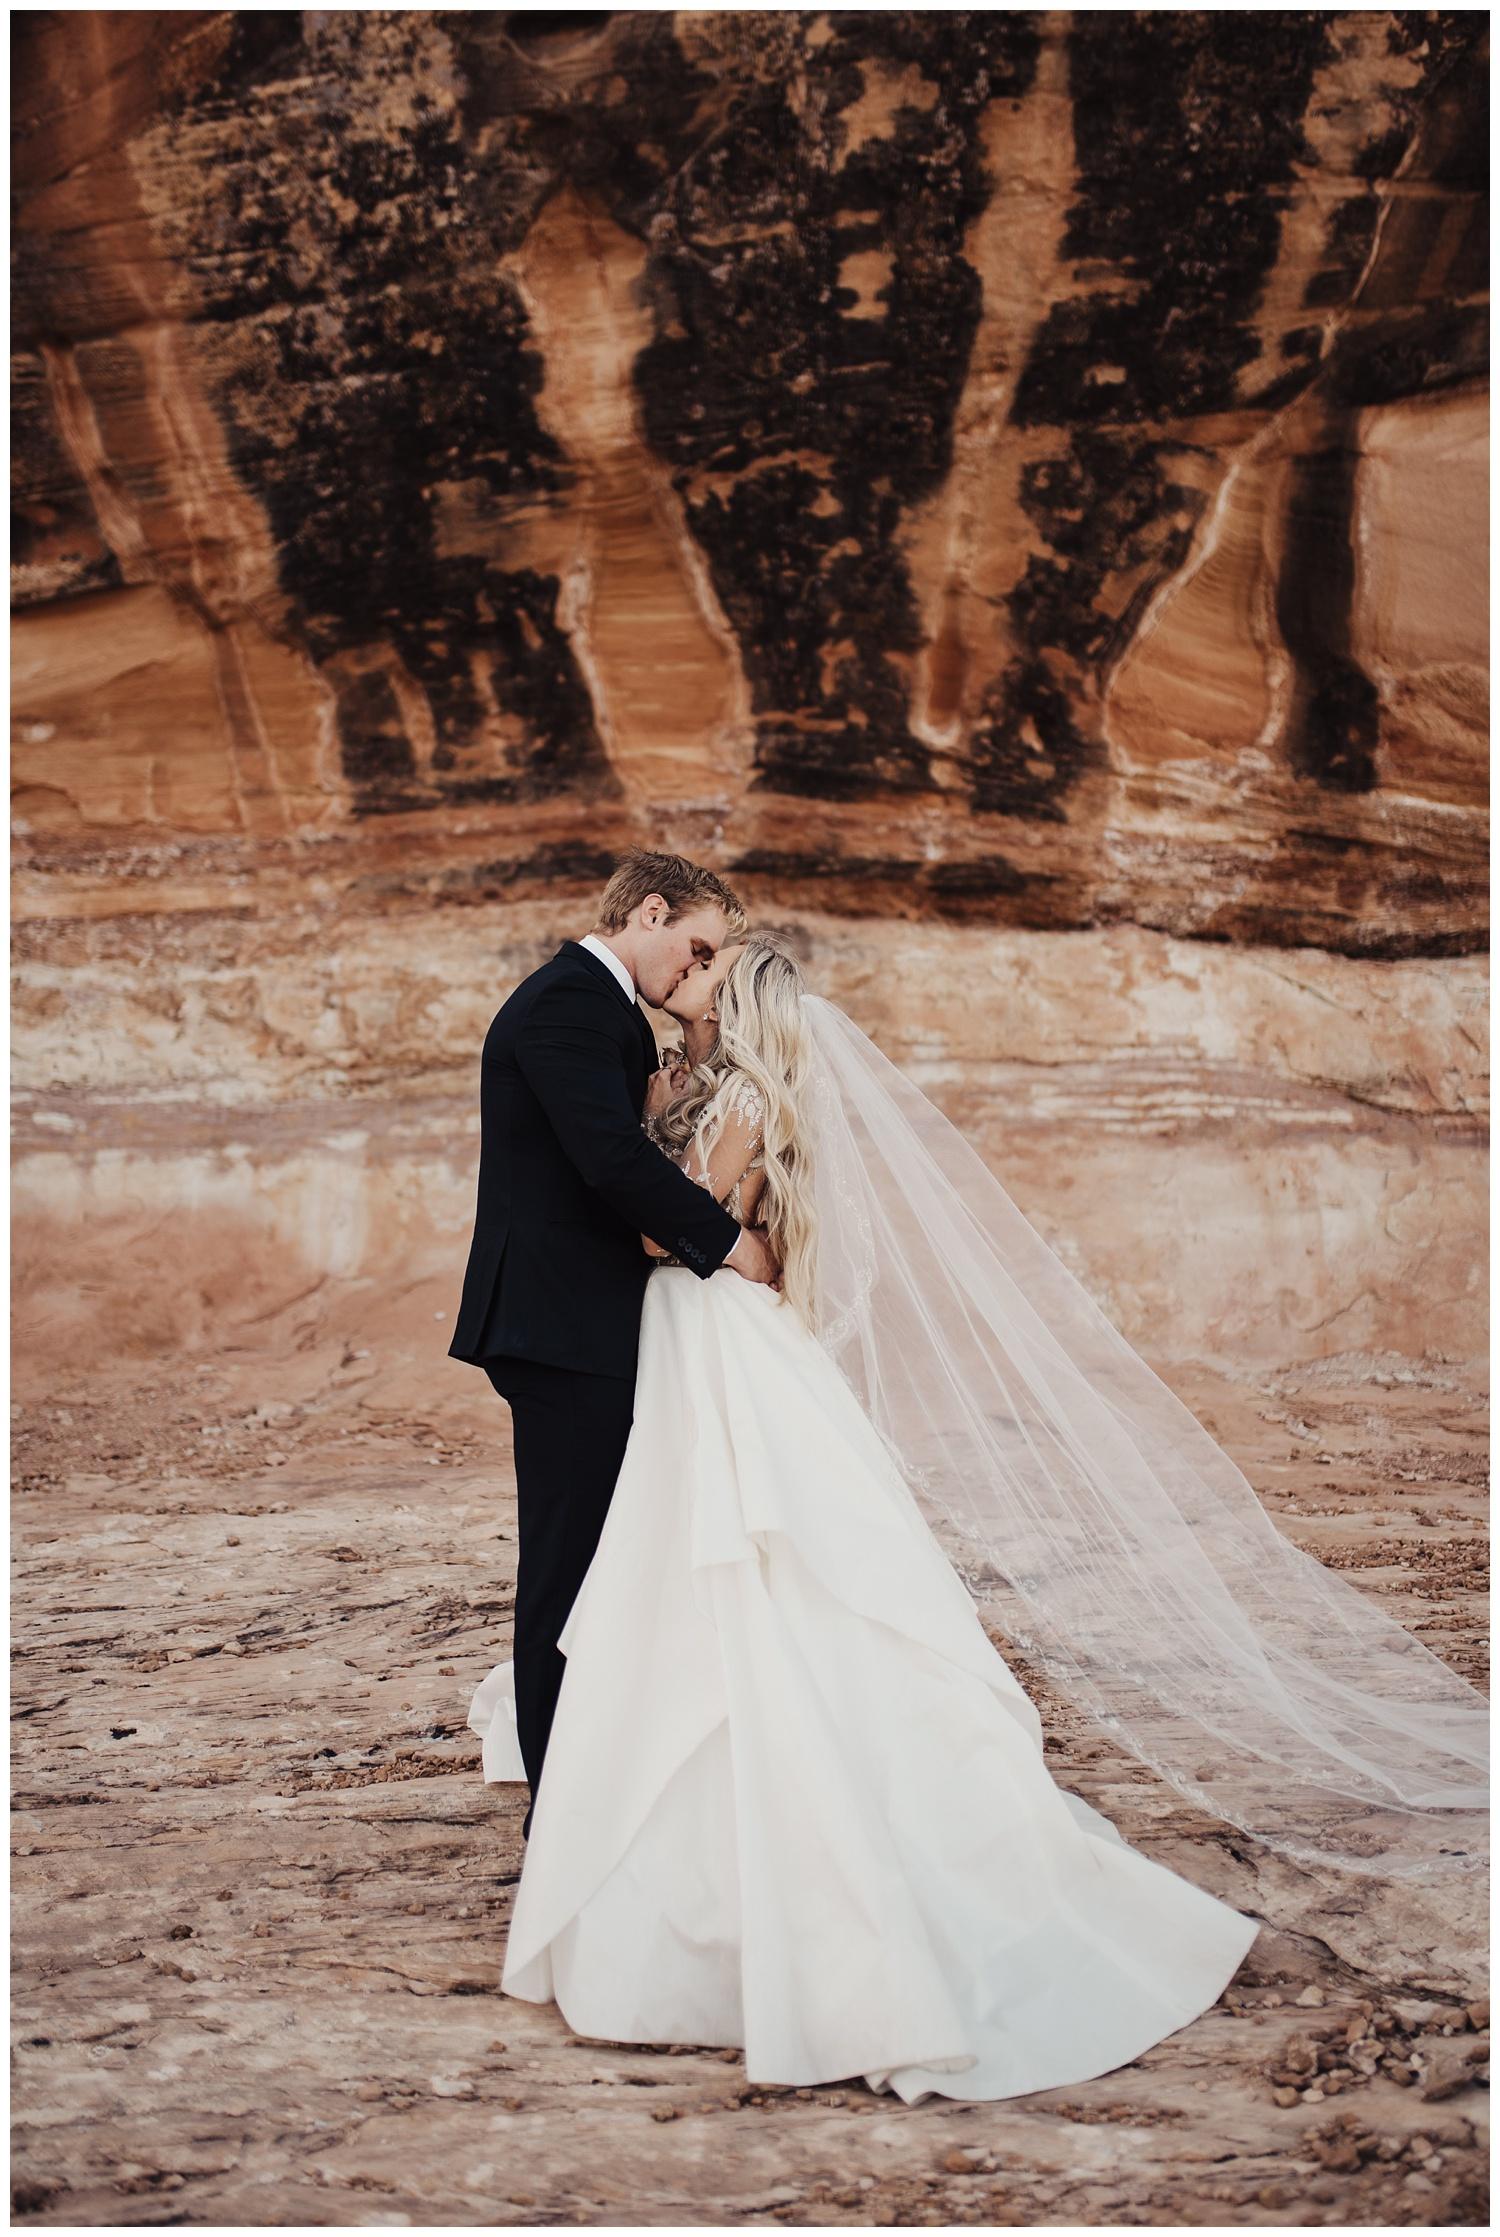 edenstraderphoto-weddingphotographer_0800.jpg